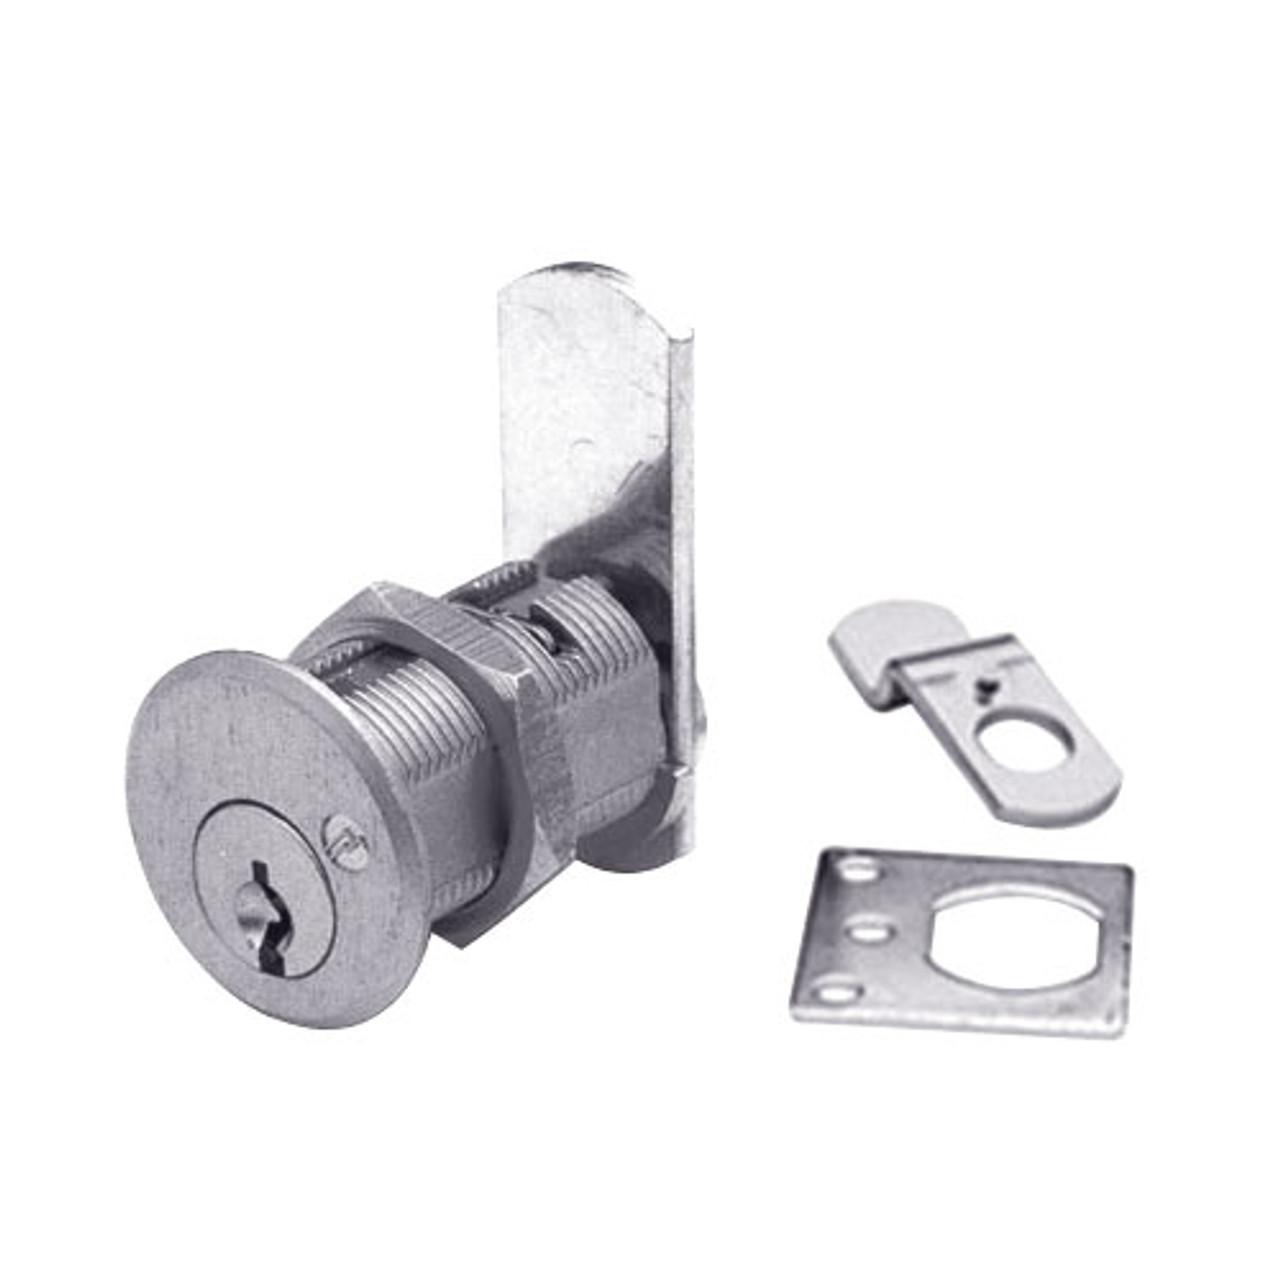 Olympus DCN4-KA103-26D Cam Locks in Satin Chrome Finish